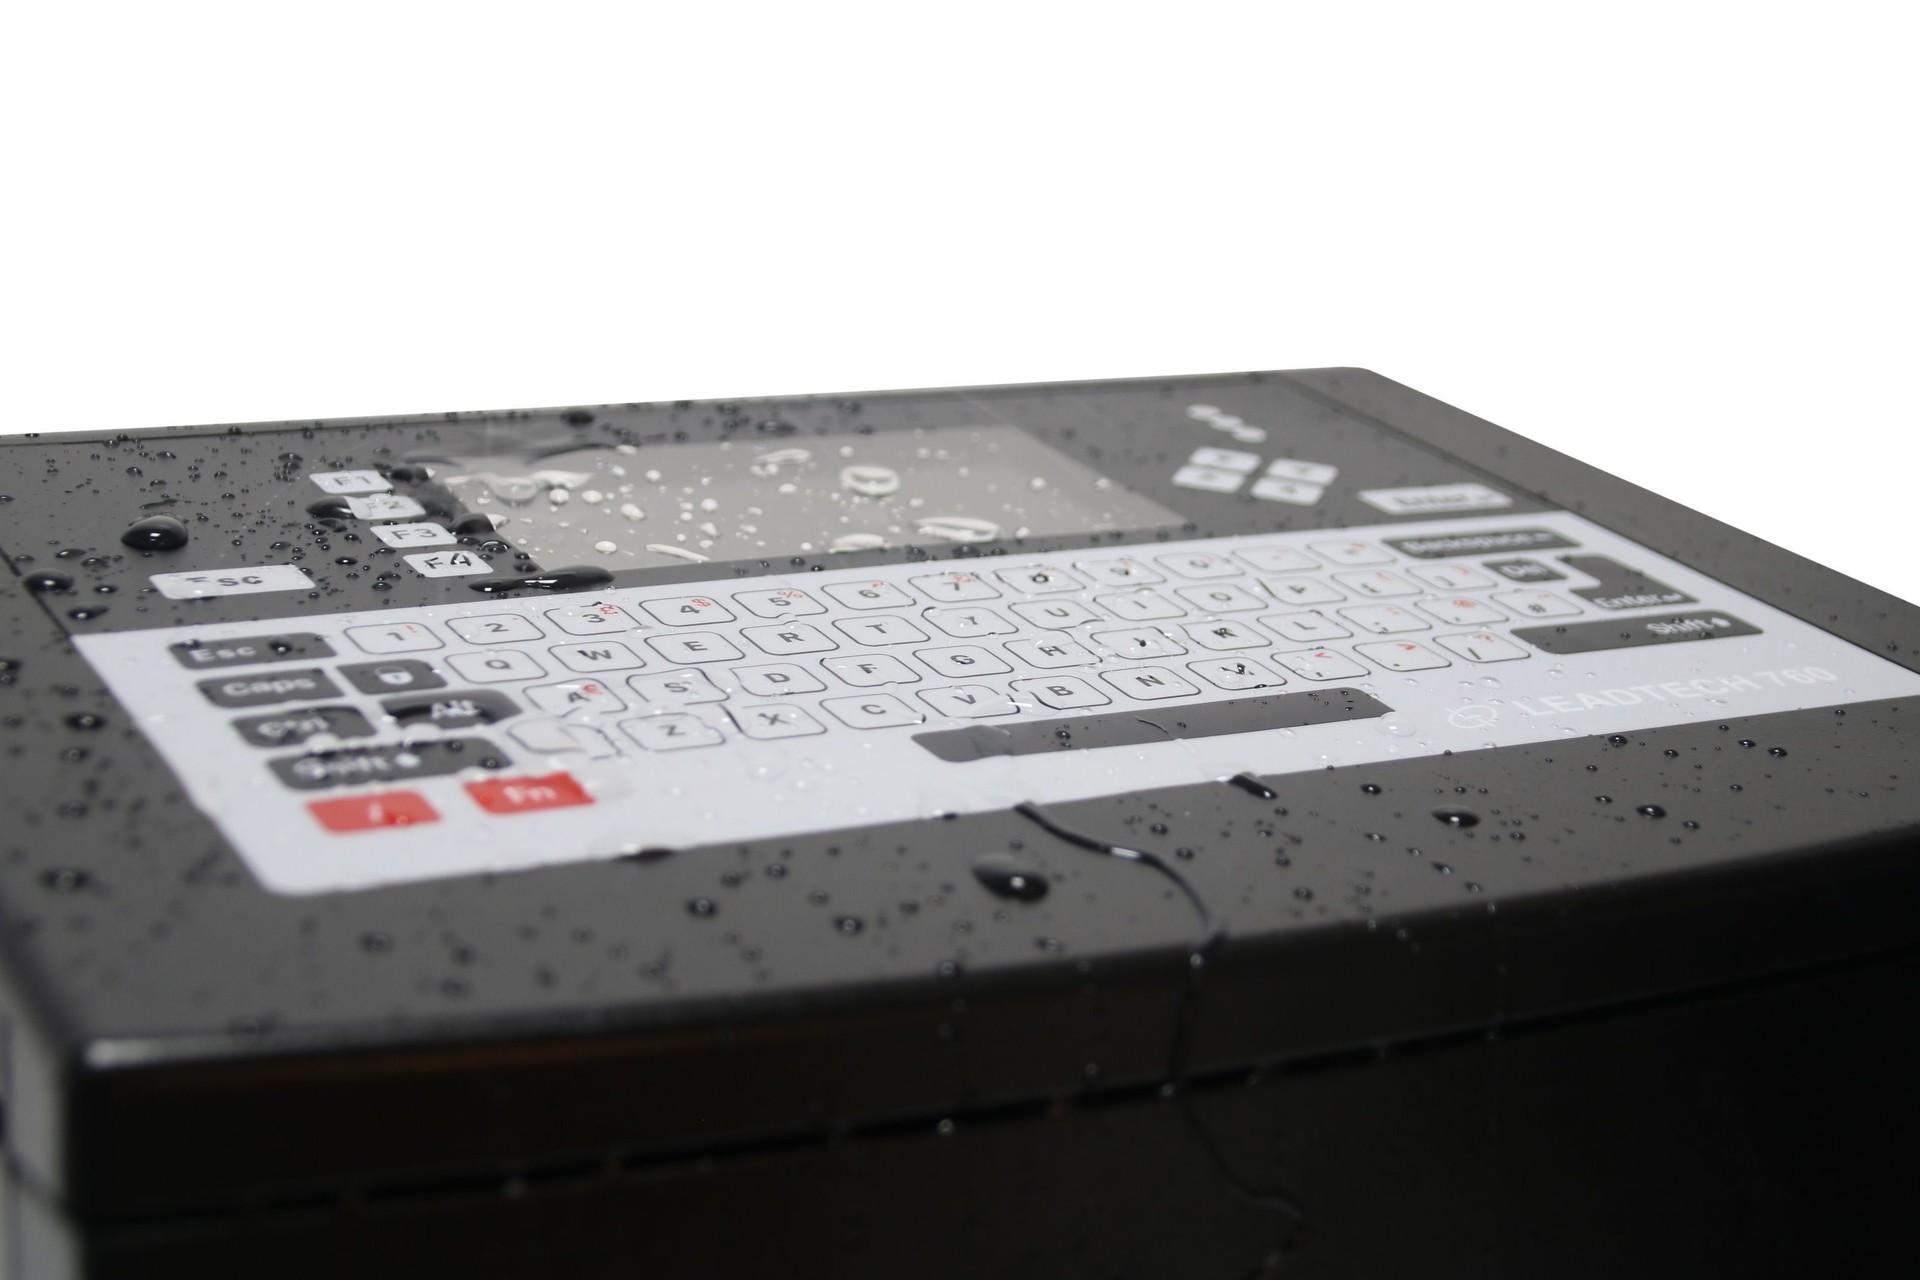 Lead Tech Lt760 Black to Blue Coding Continuous Cij Inkjet Printer